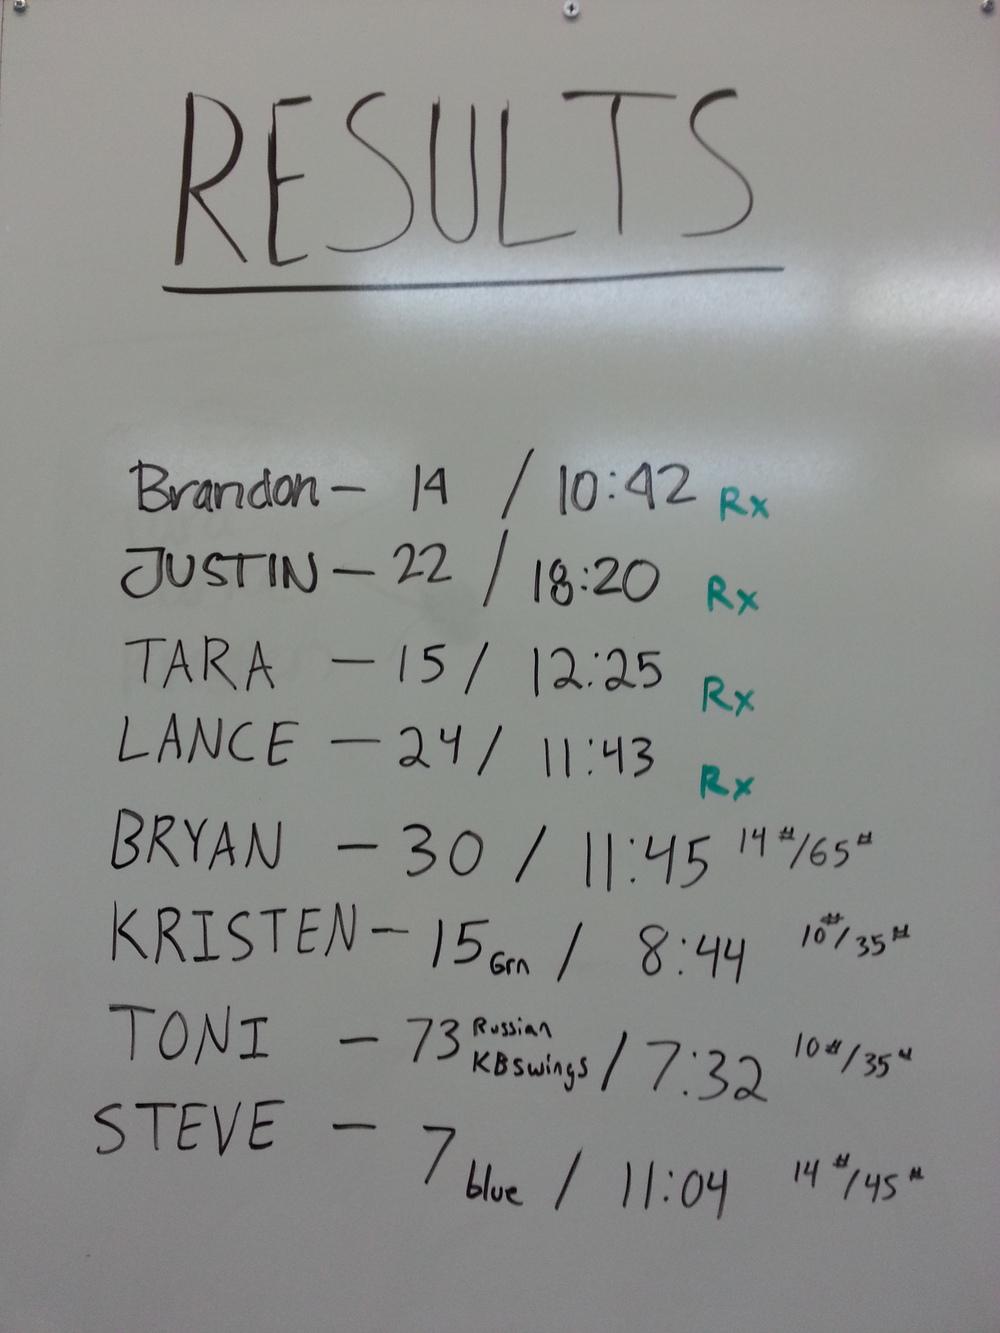 6/3 WOD results